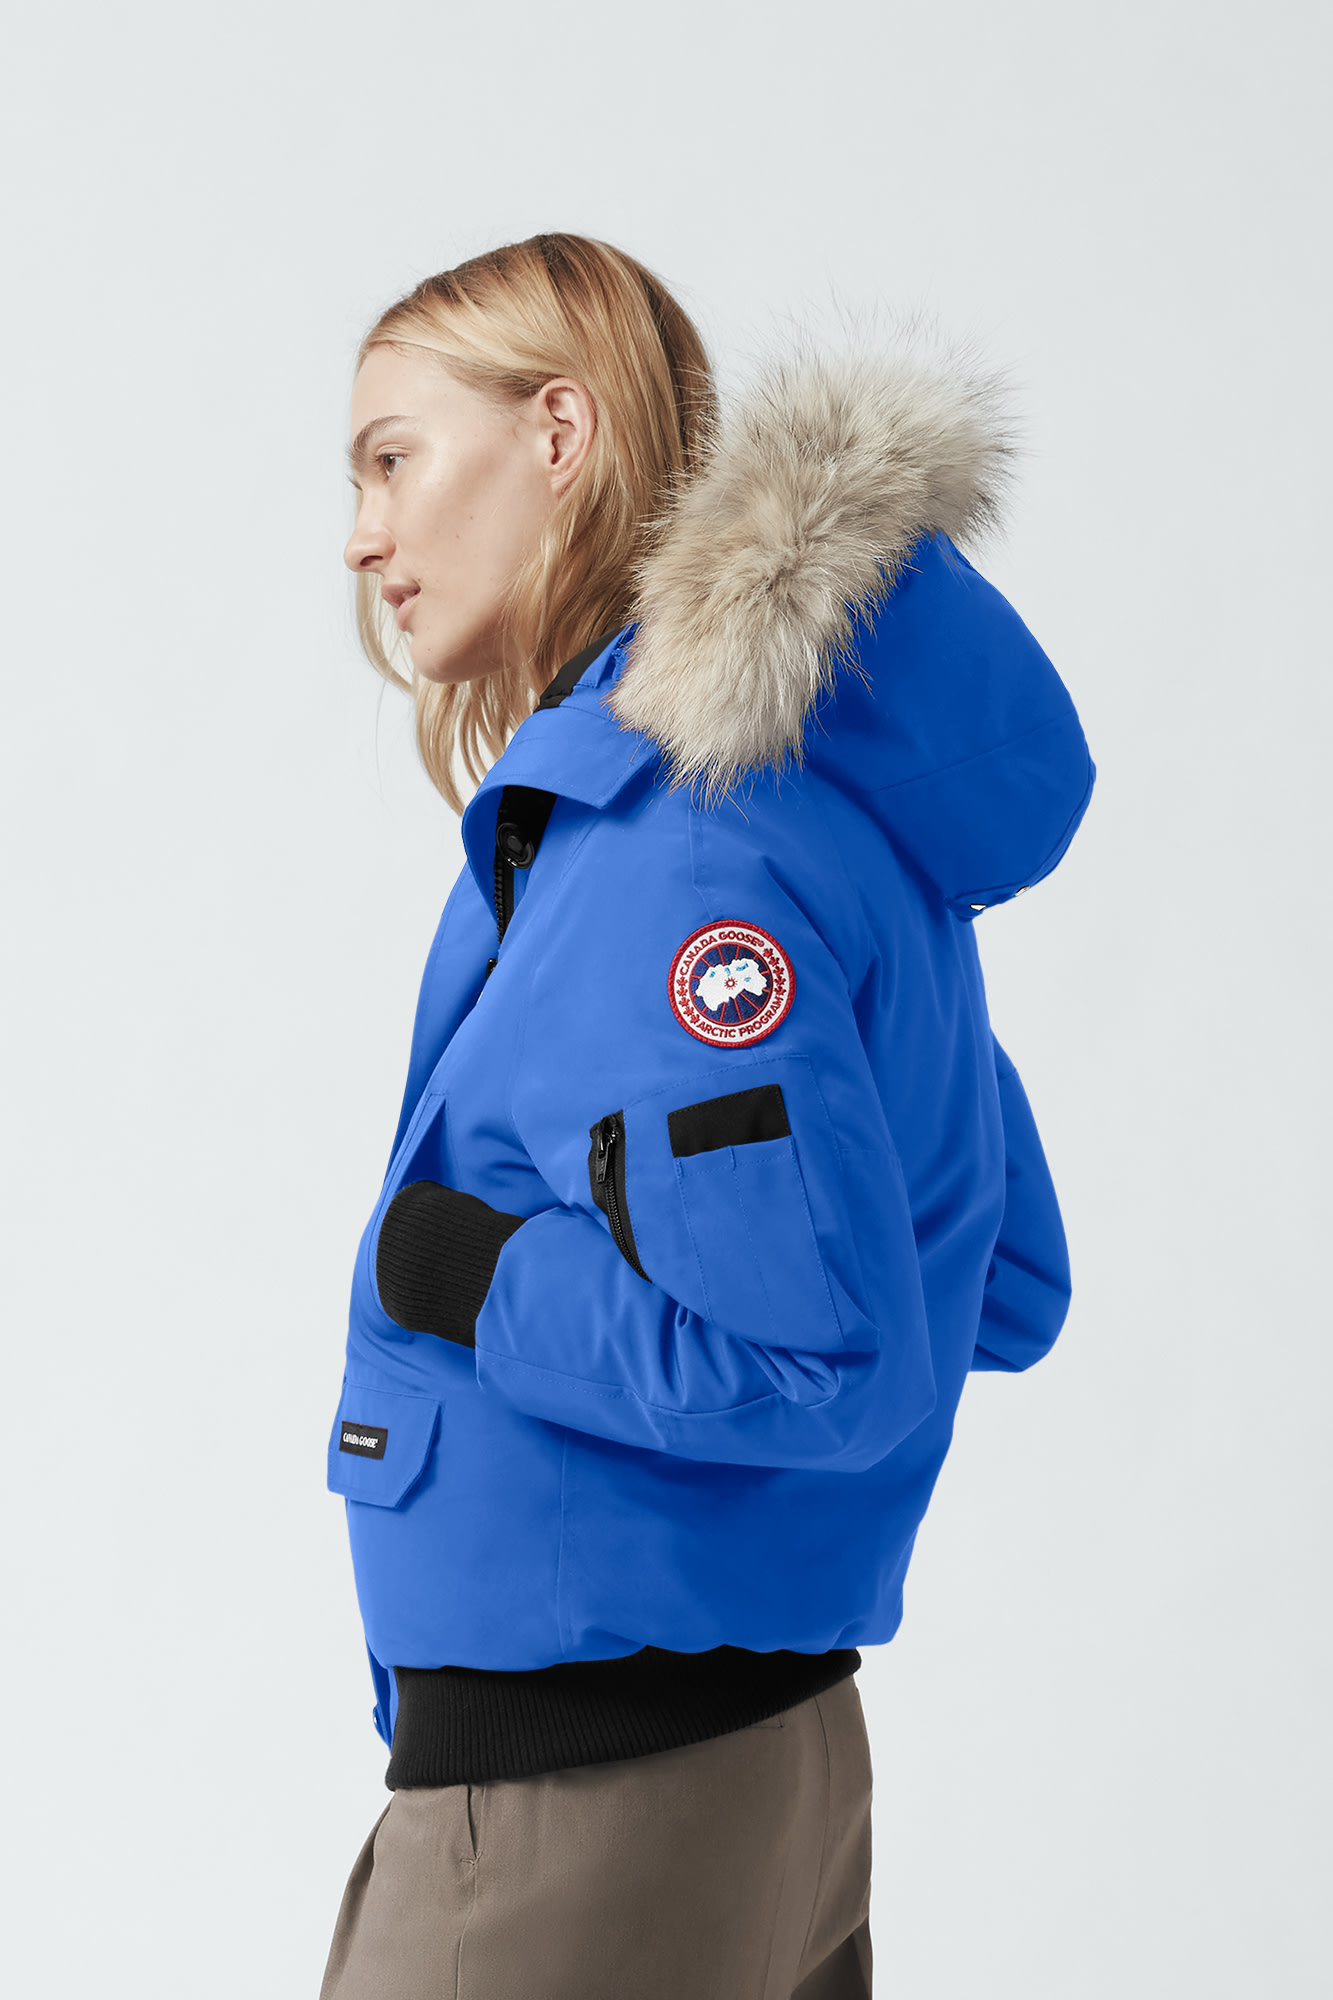 Canada Goose Polar Bear International Expedition Chilliwack Bomber Women's